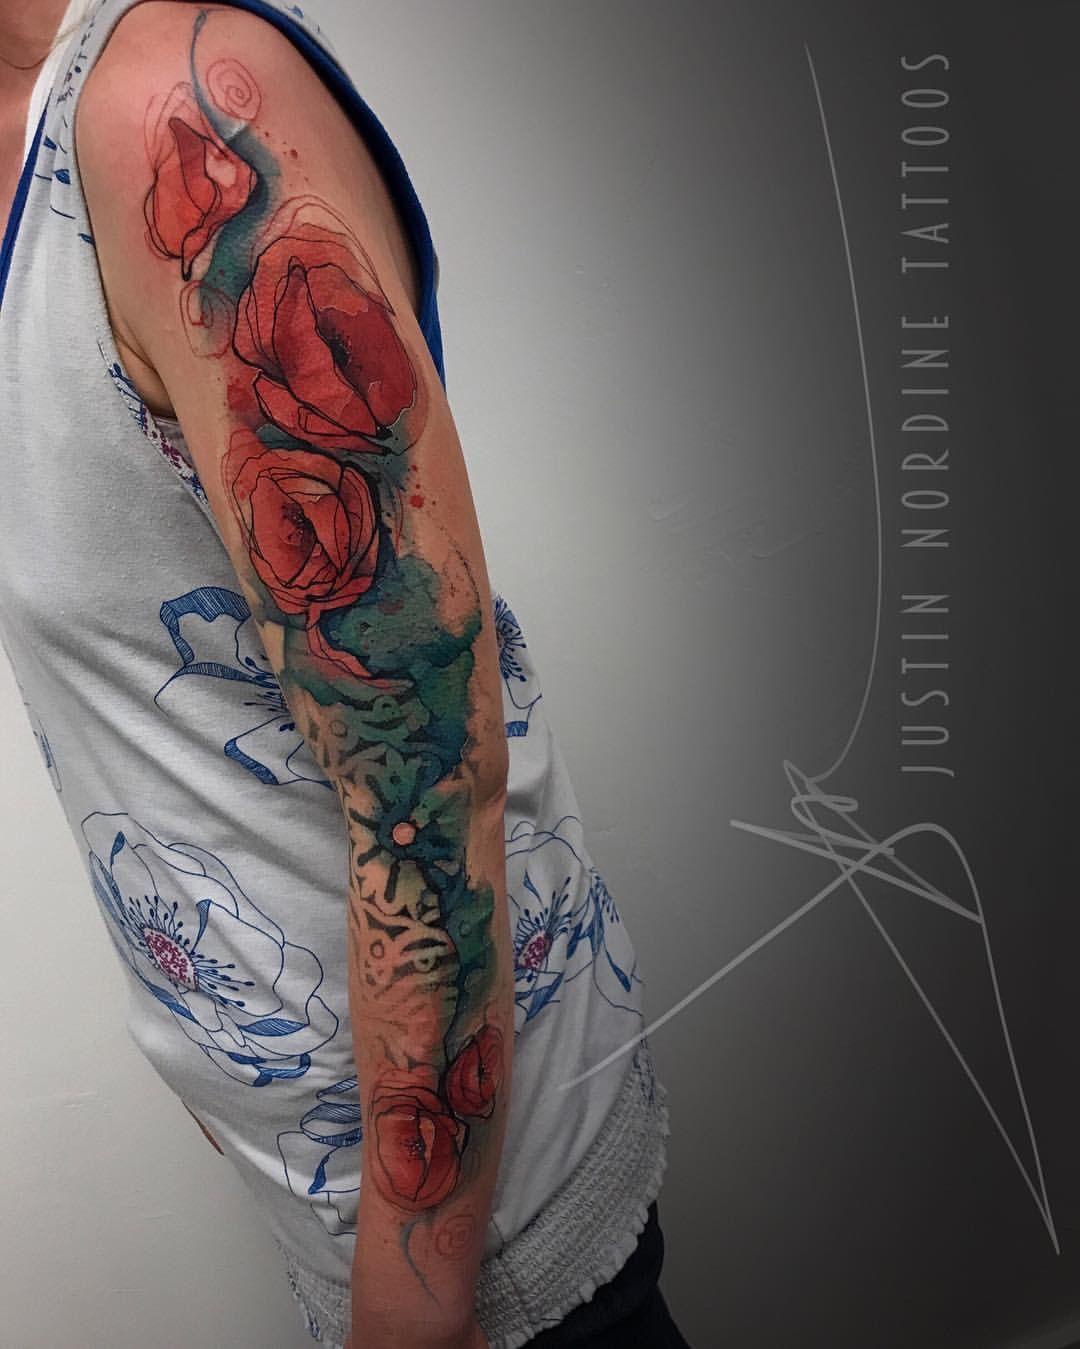 Pin by Digitalkg on Tattoos & Body Art Watercolor tattoo